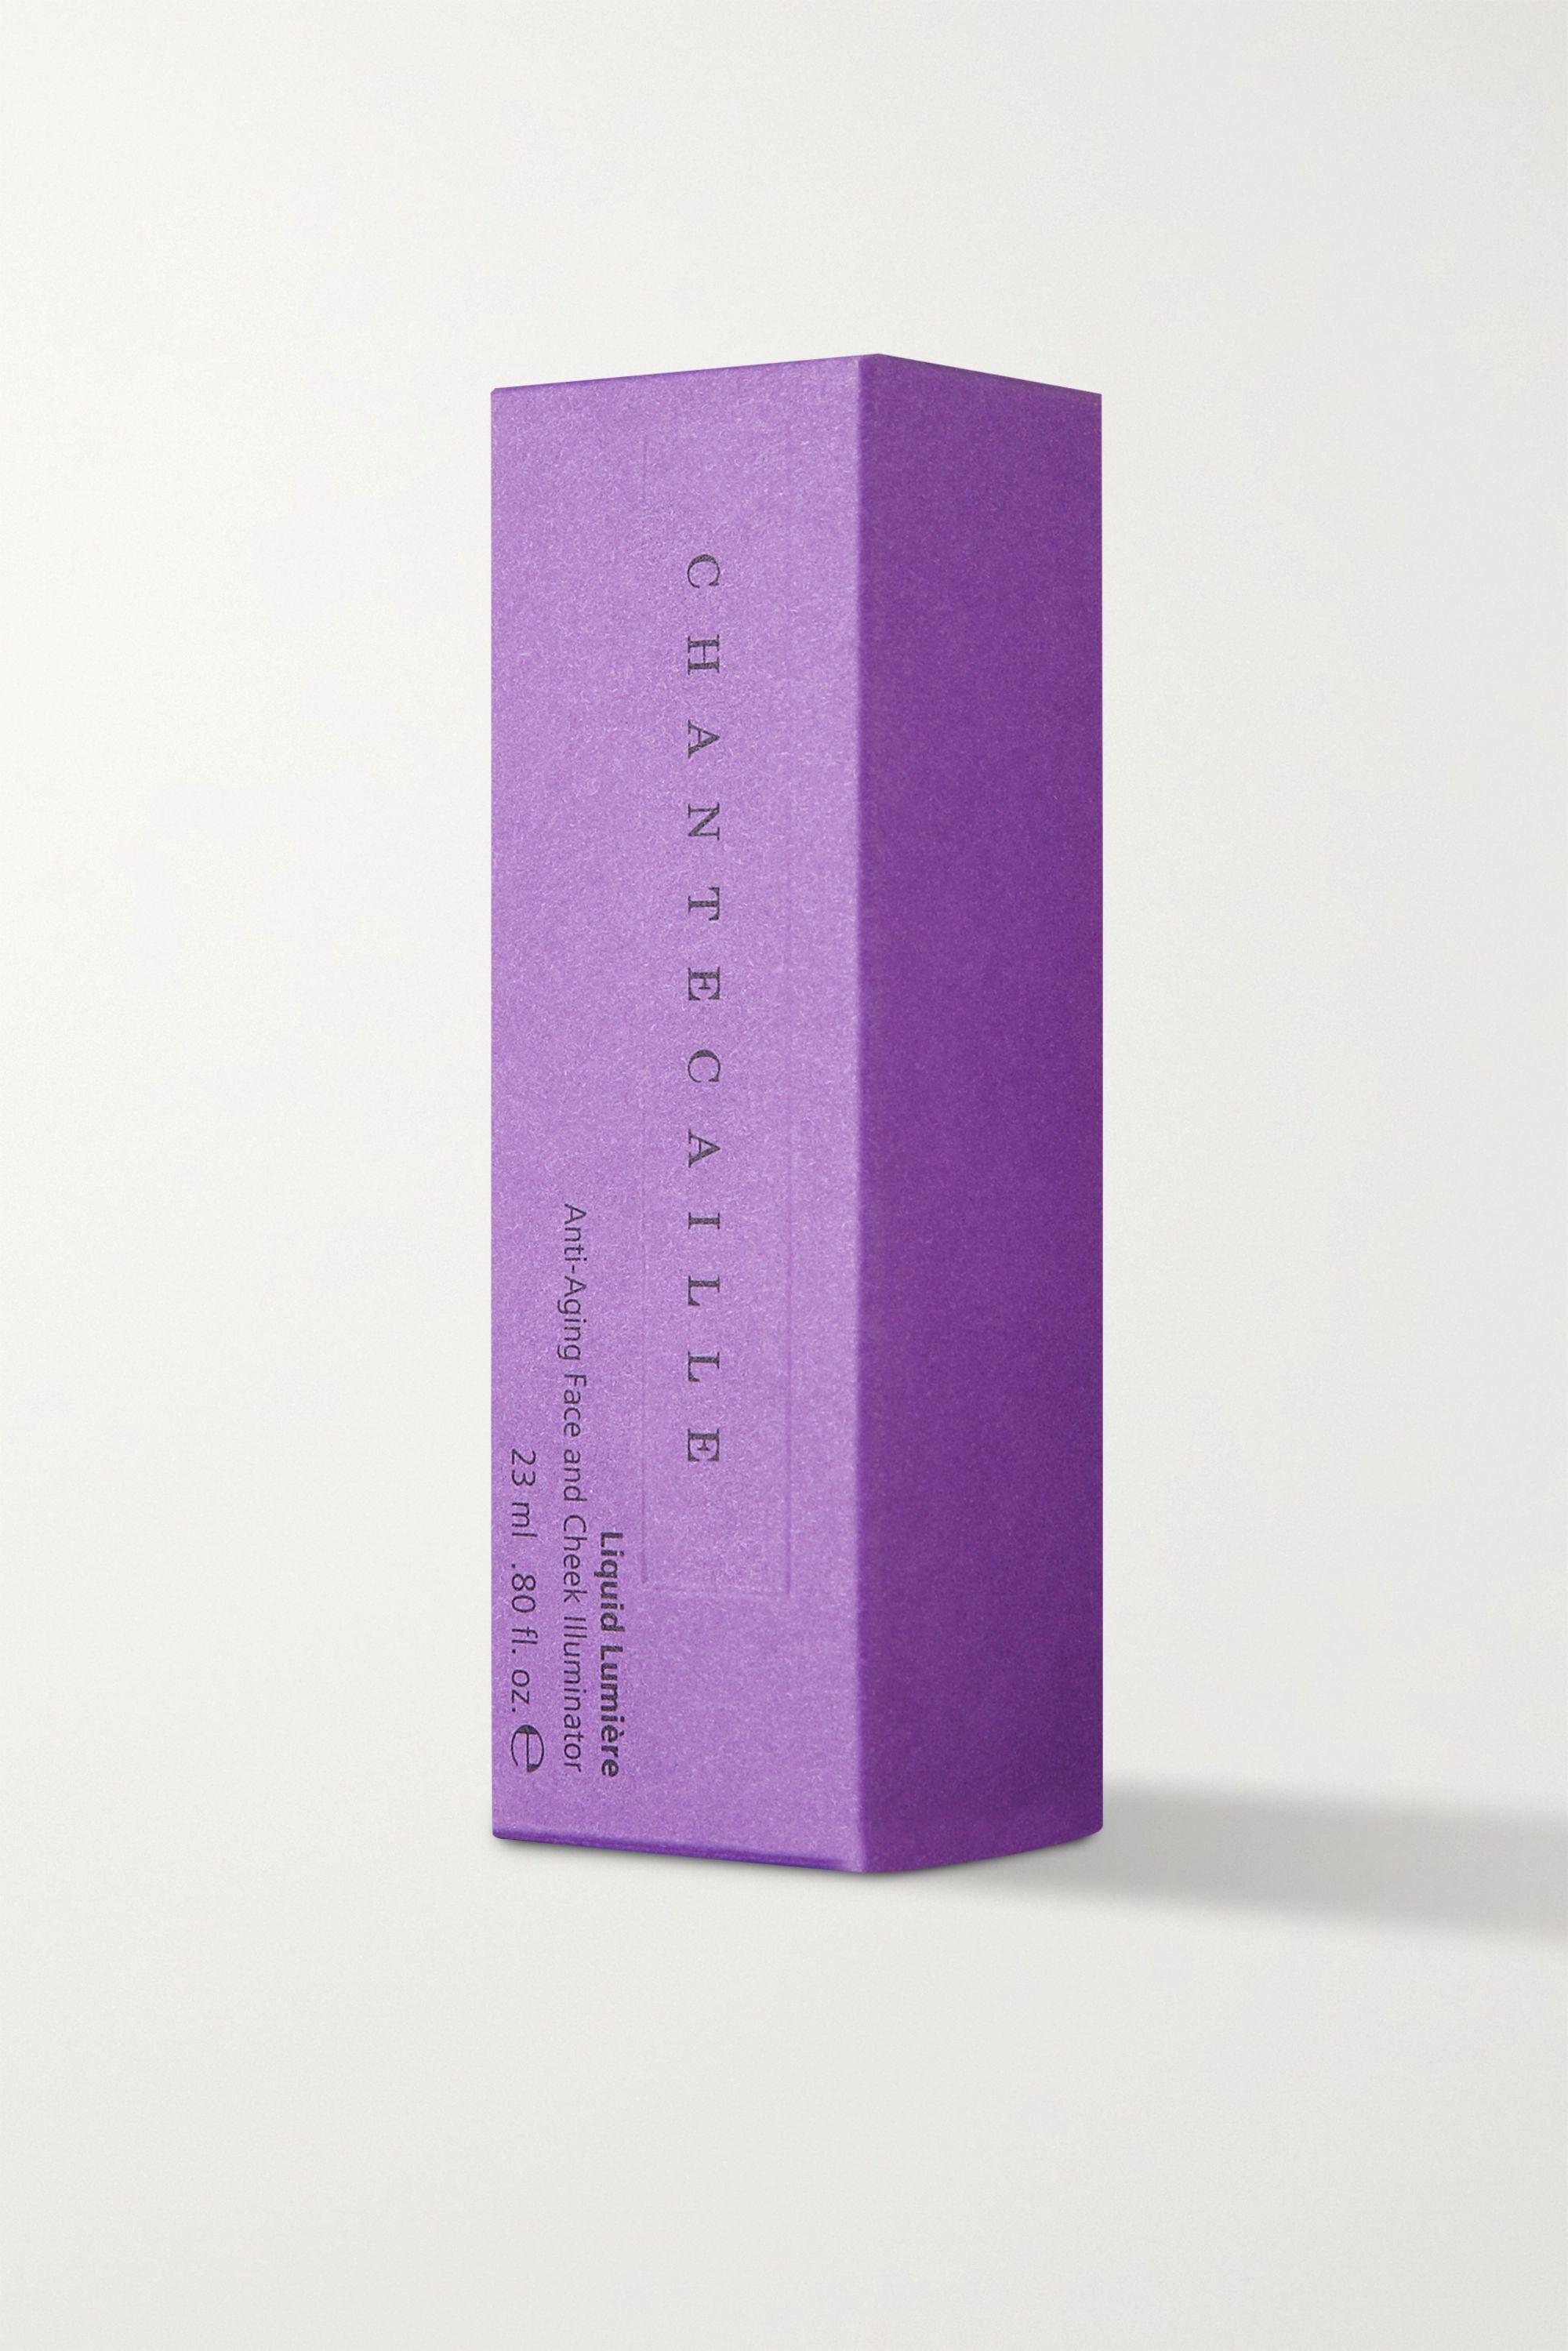 Chantecaille Liquid Lumière Anti-Aging Illuminator – Brilliance, 23 ml – Highlighter